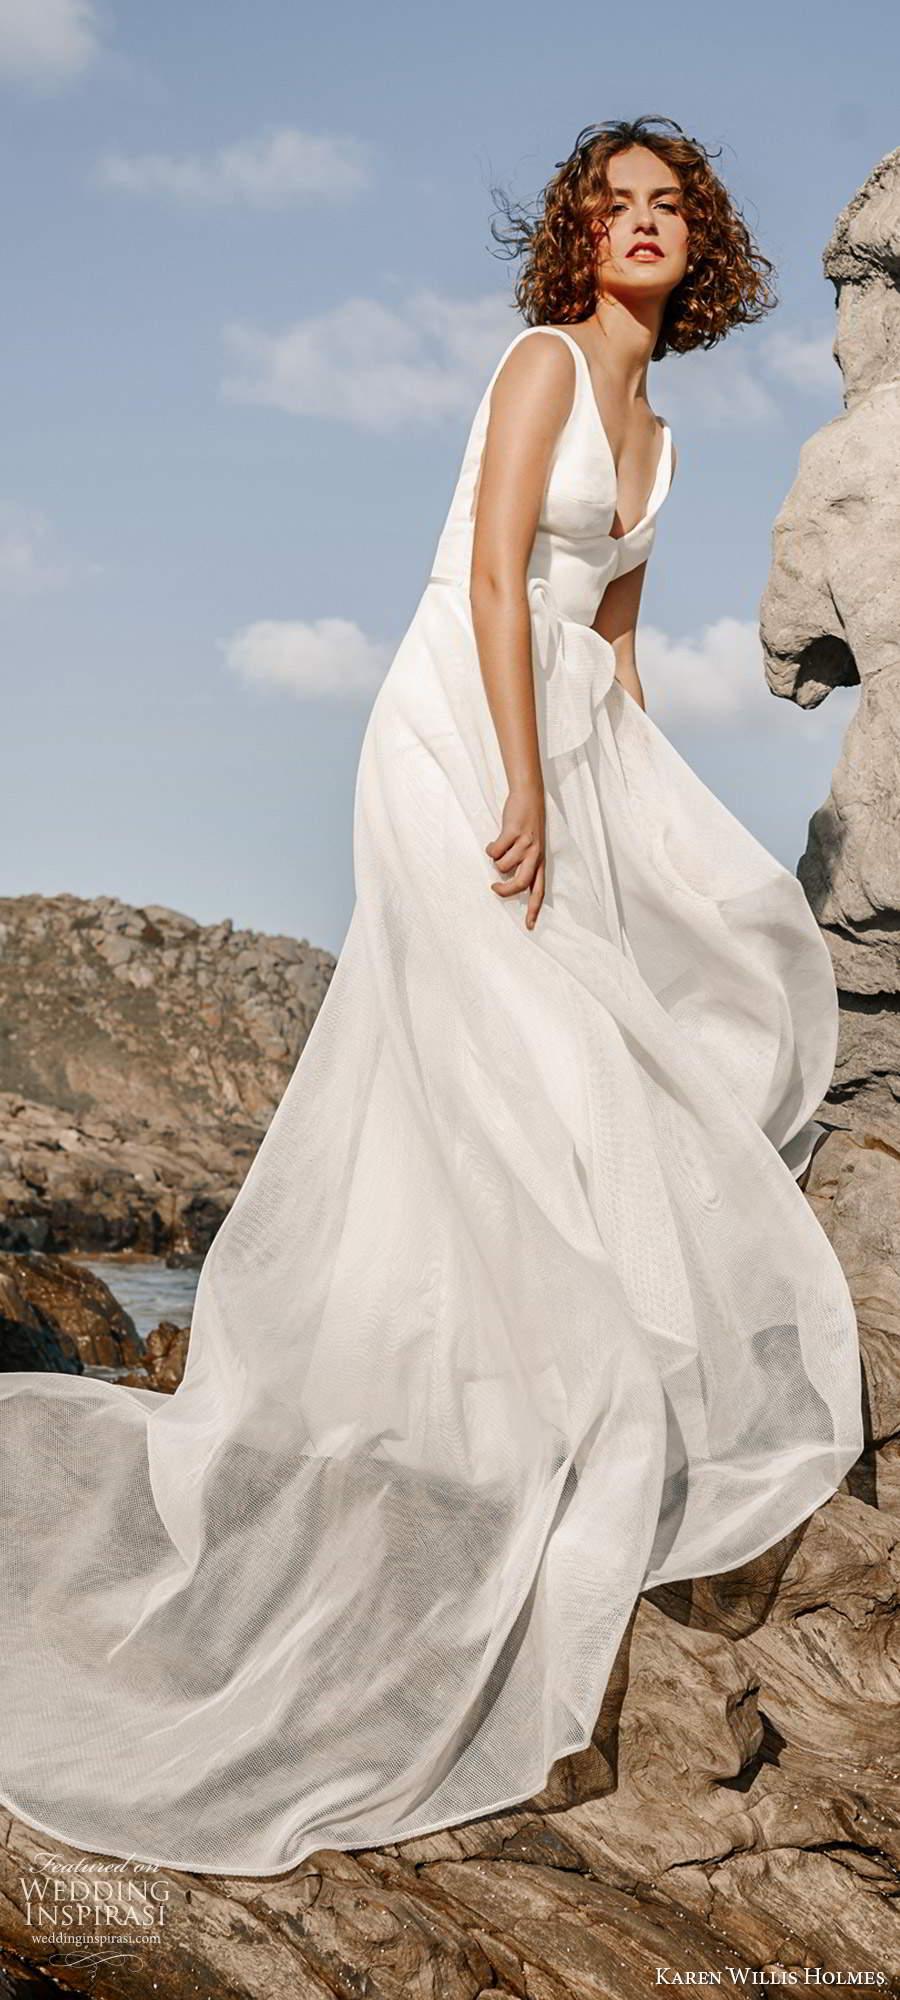 karen willis holmes 2020 bridal sleeveless straps v neckline clean minimally embellished a line ball gown wedding dress chapel train (3) mv